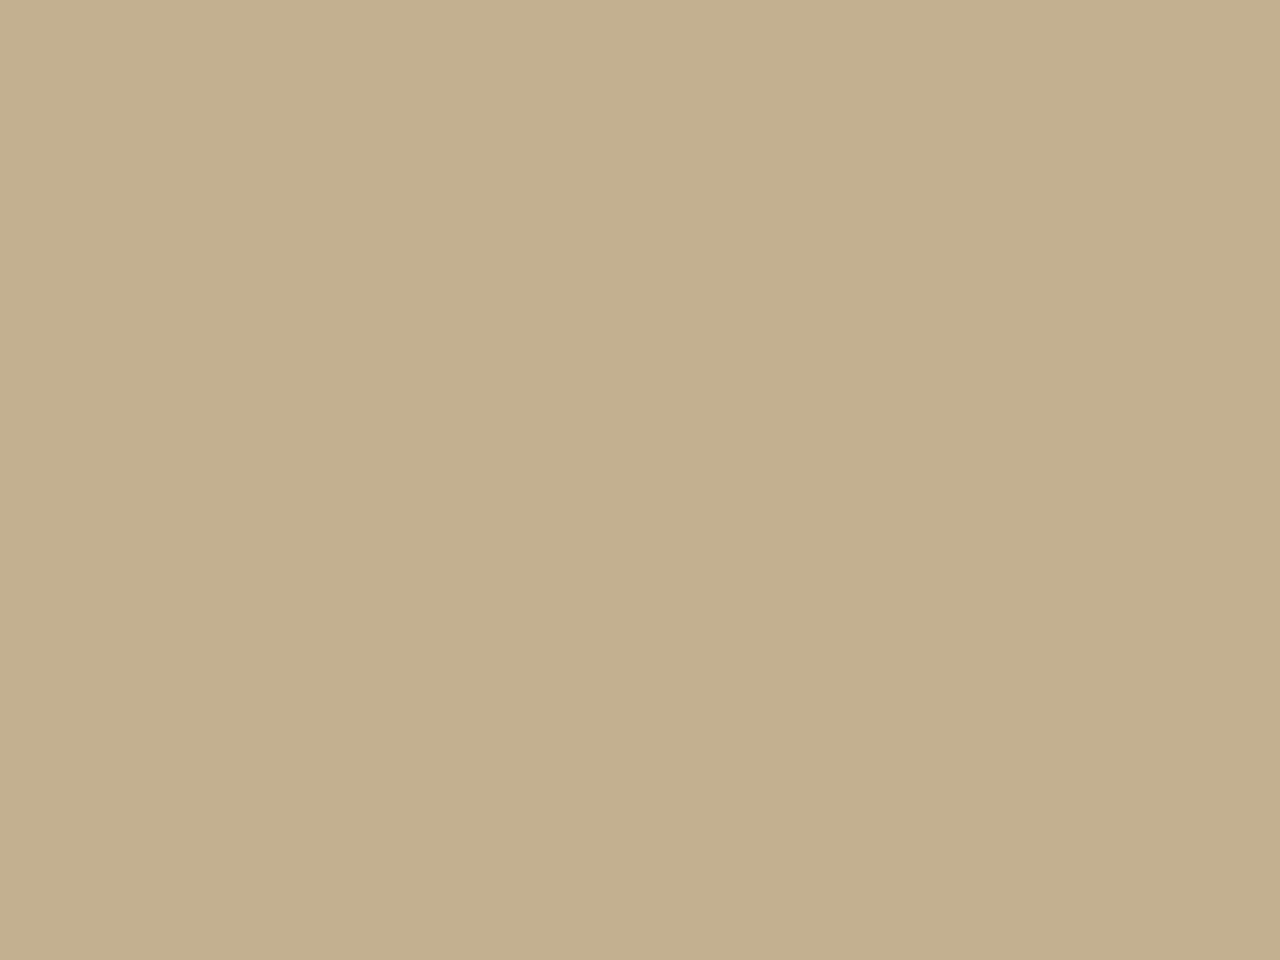 1280x960 Khaki Web Solid Color Background